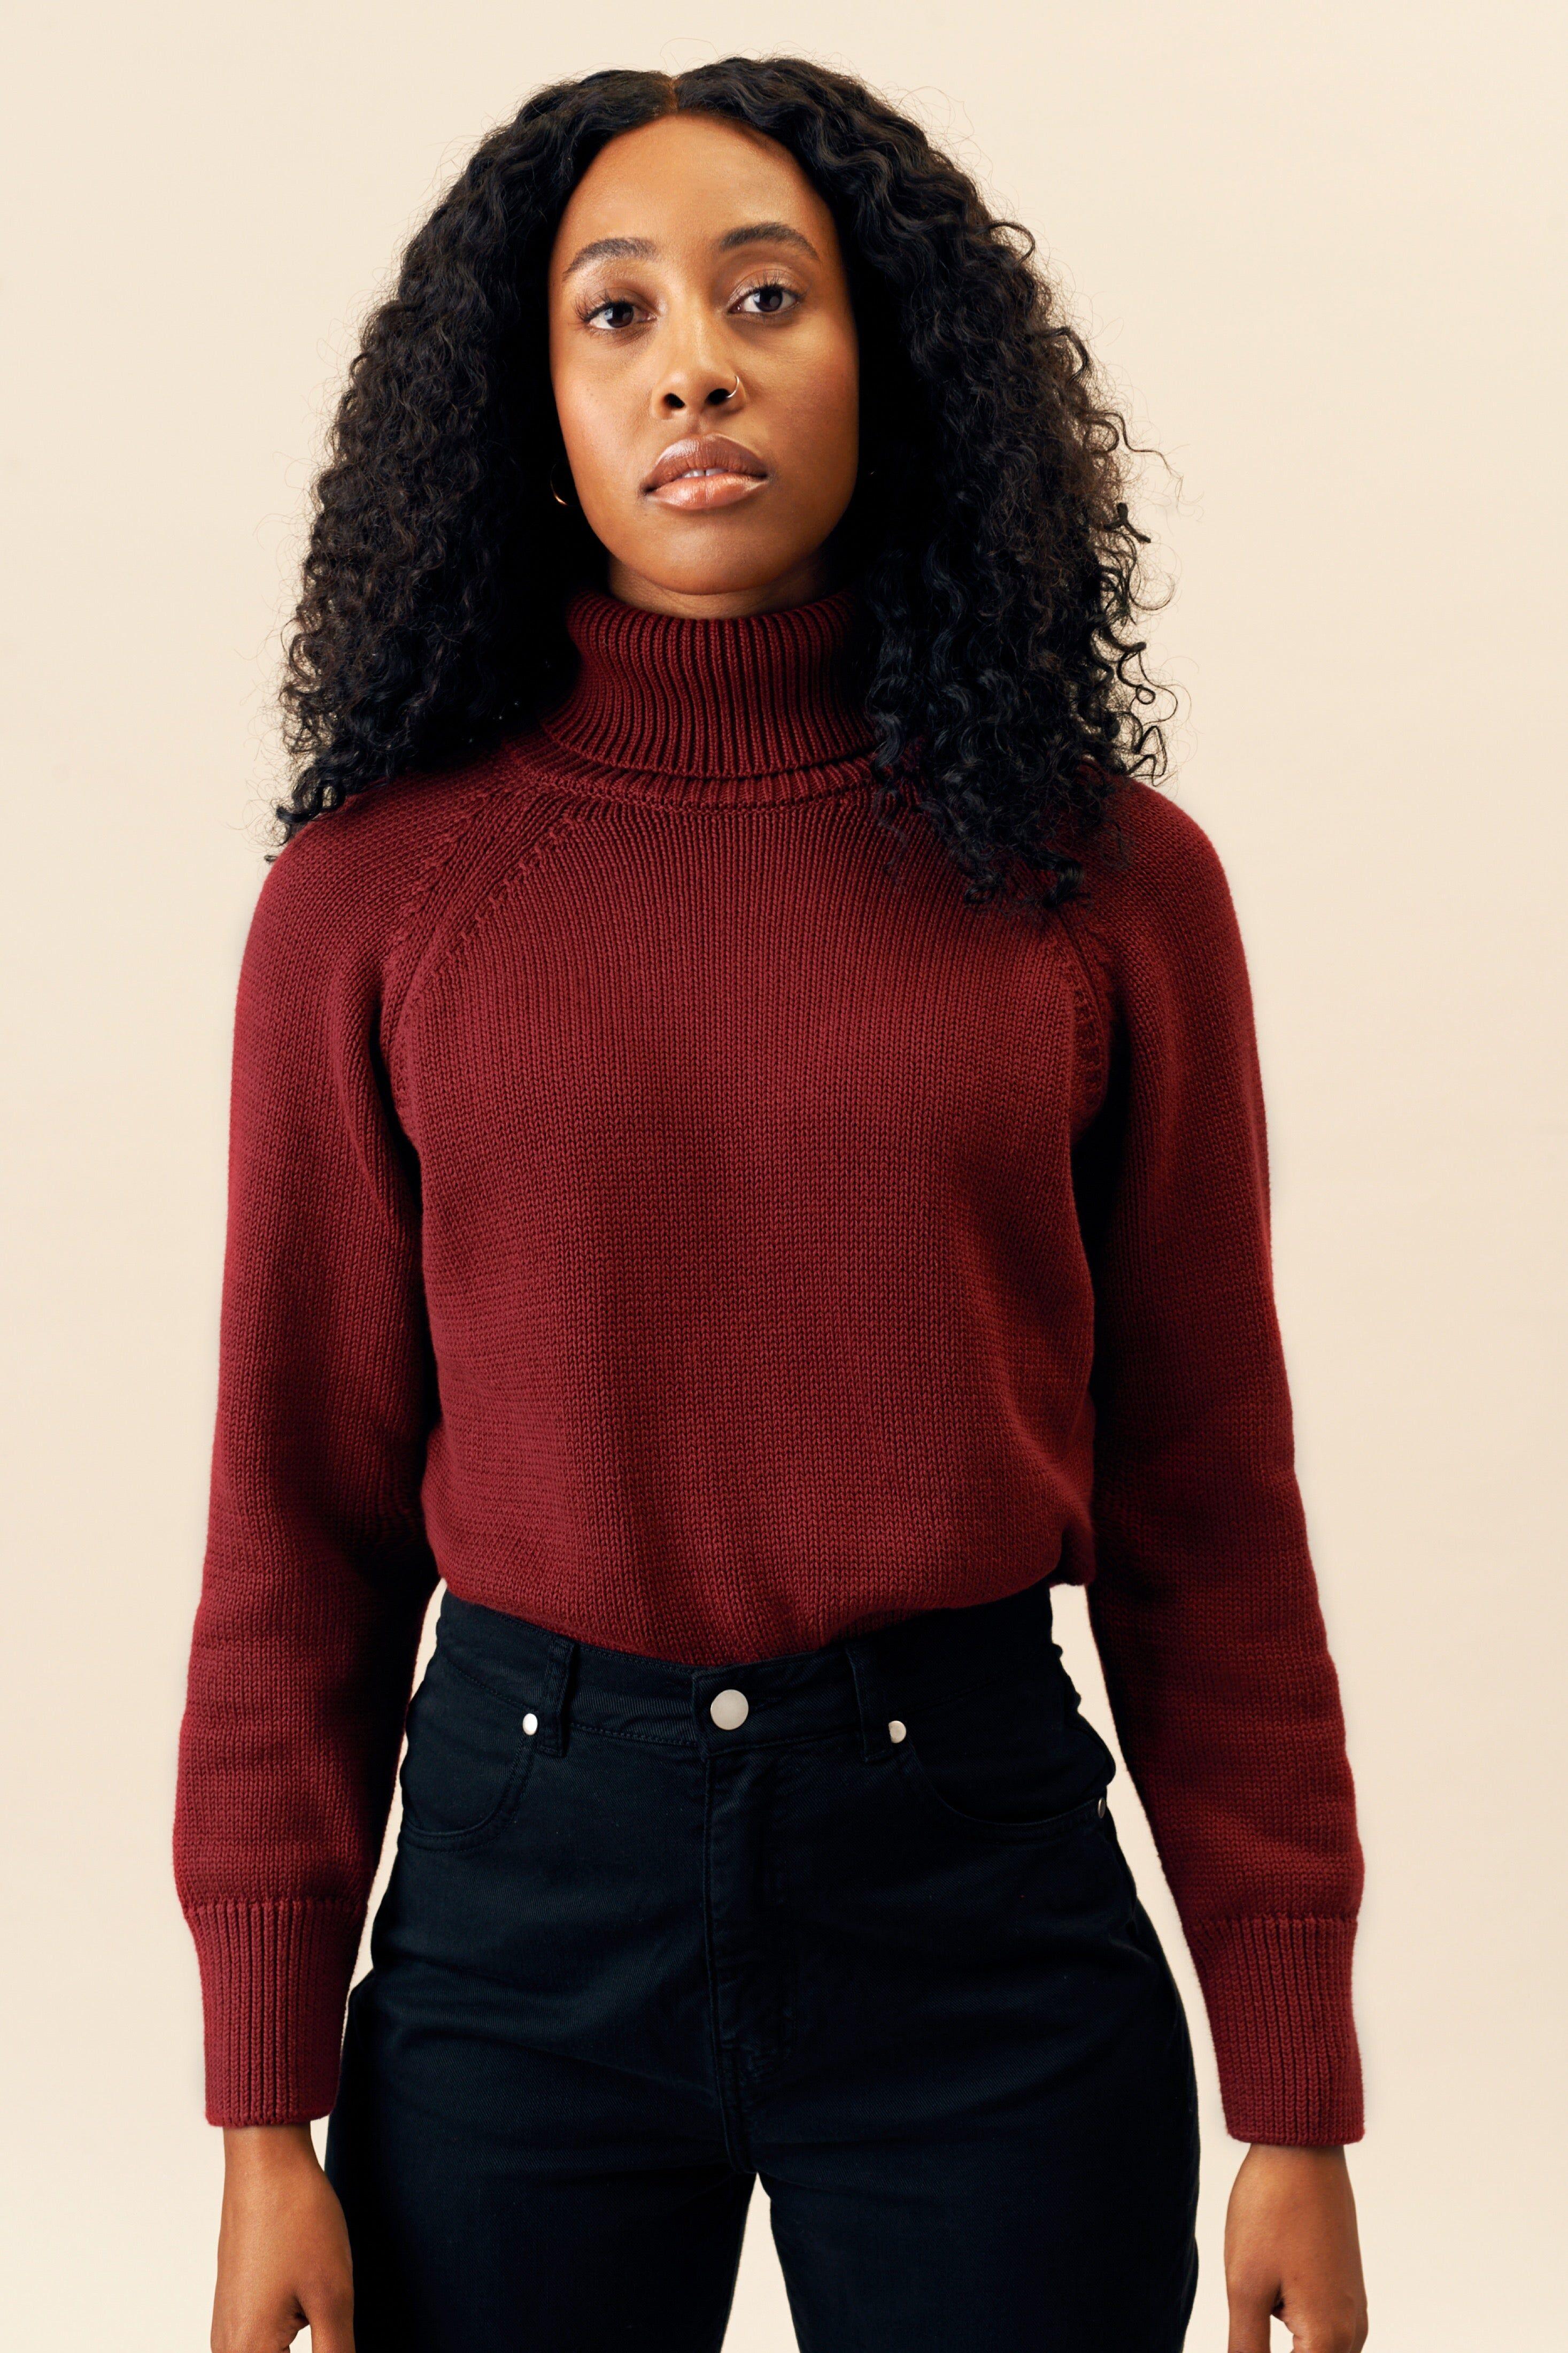 Kotn Women's Turtleneck Top Sweater in Merlot Red, Size Small